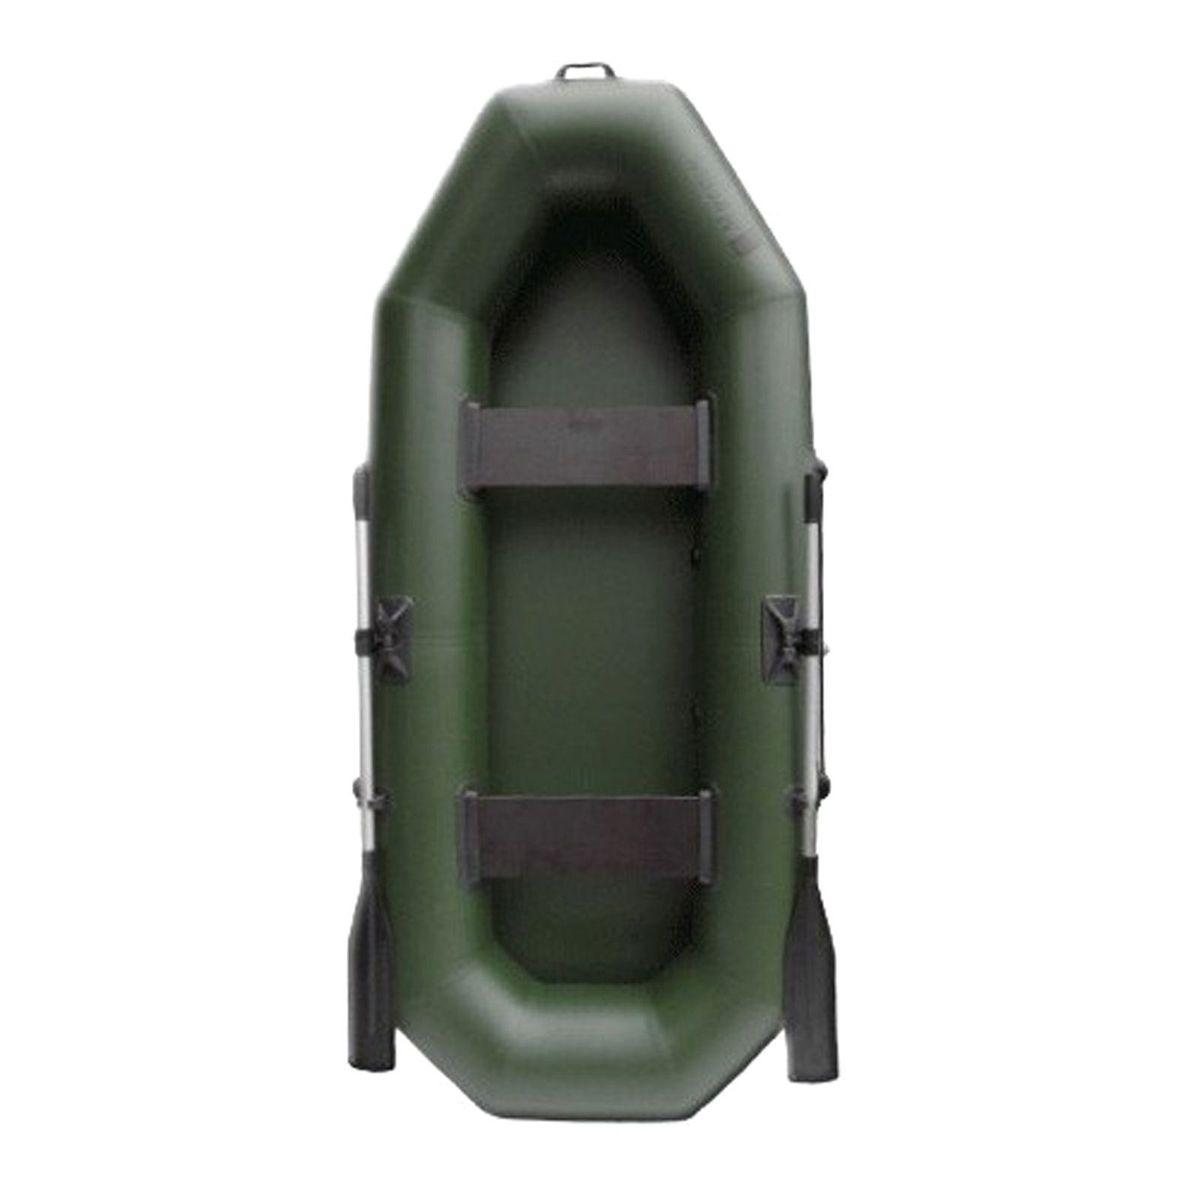 Лодка надувная Муссон S 262, цвет: зеленый